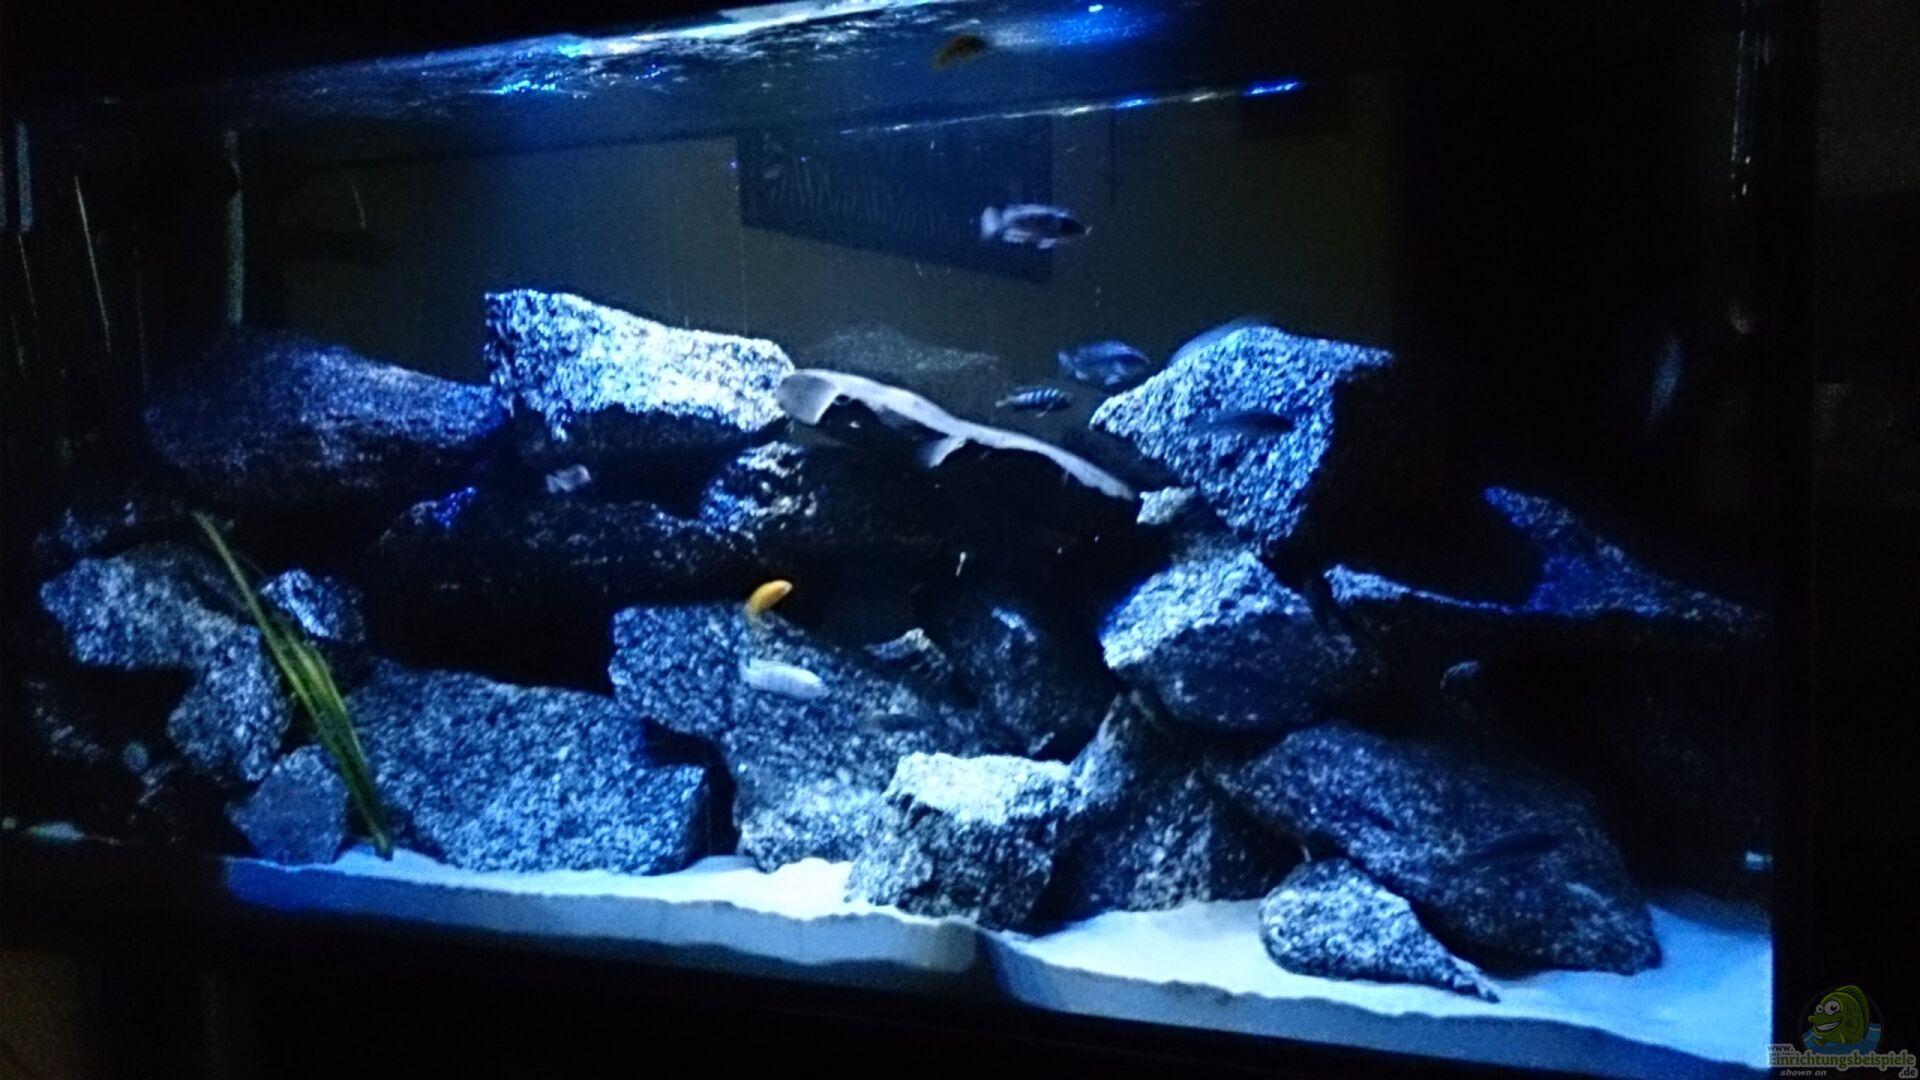 Aquarium von florian suft becken 28016 for Aquarium becken